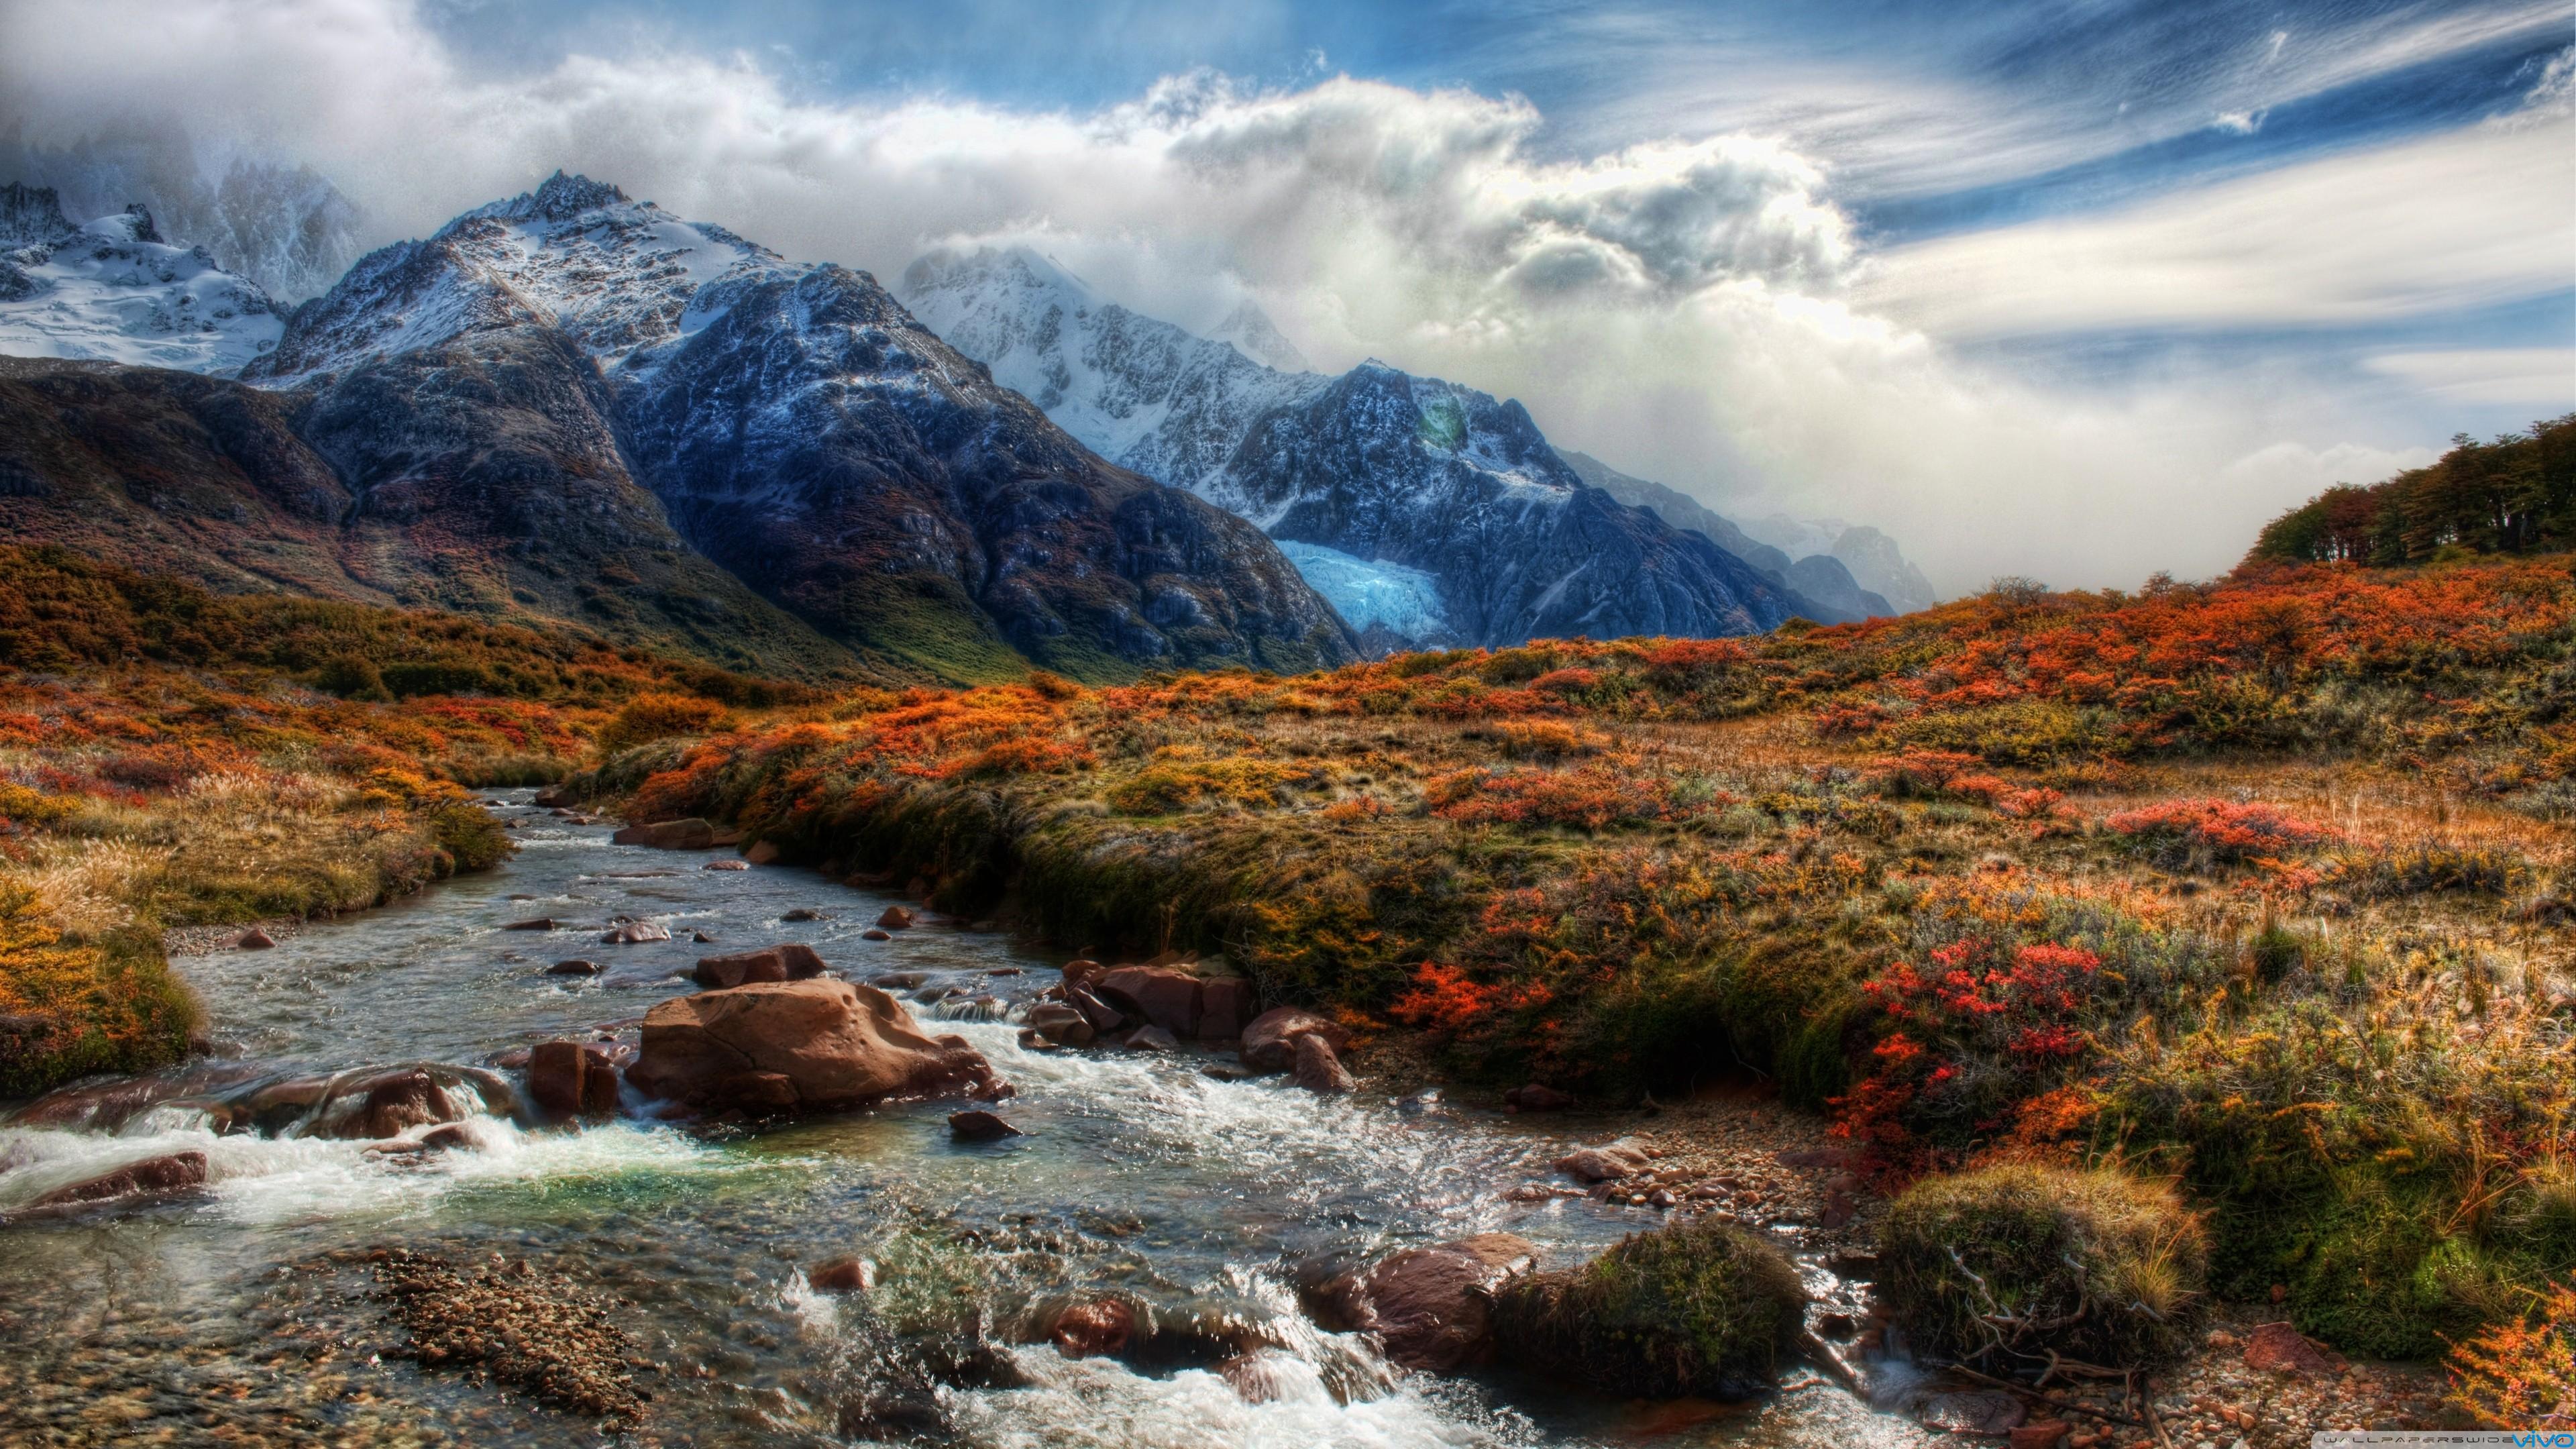 mountain_stream_3-wallpaper-3840x2160.jpg